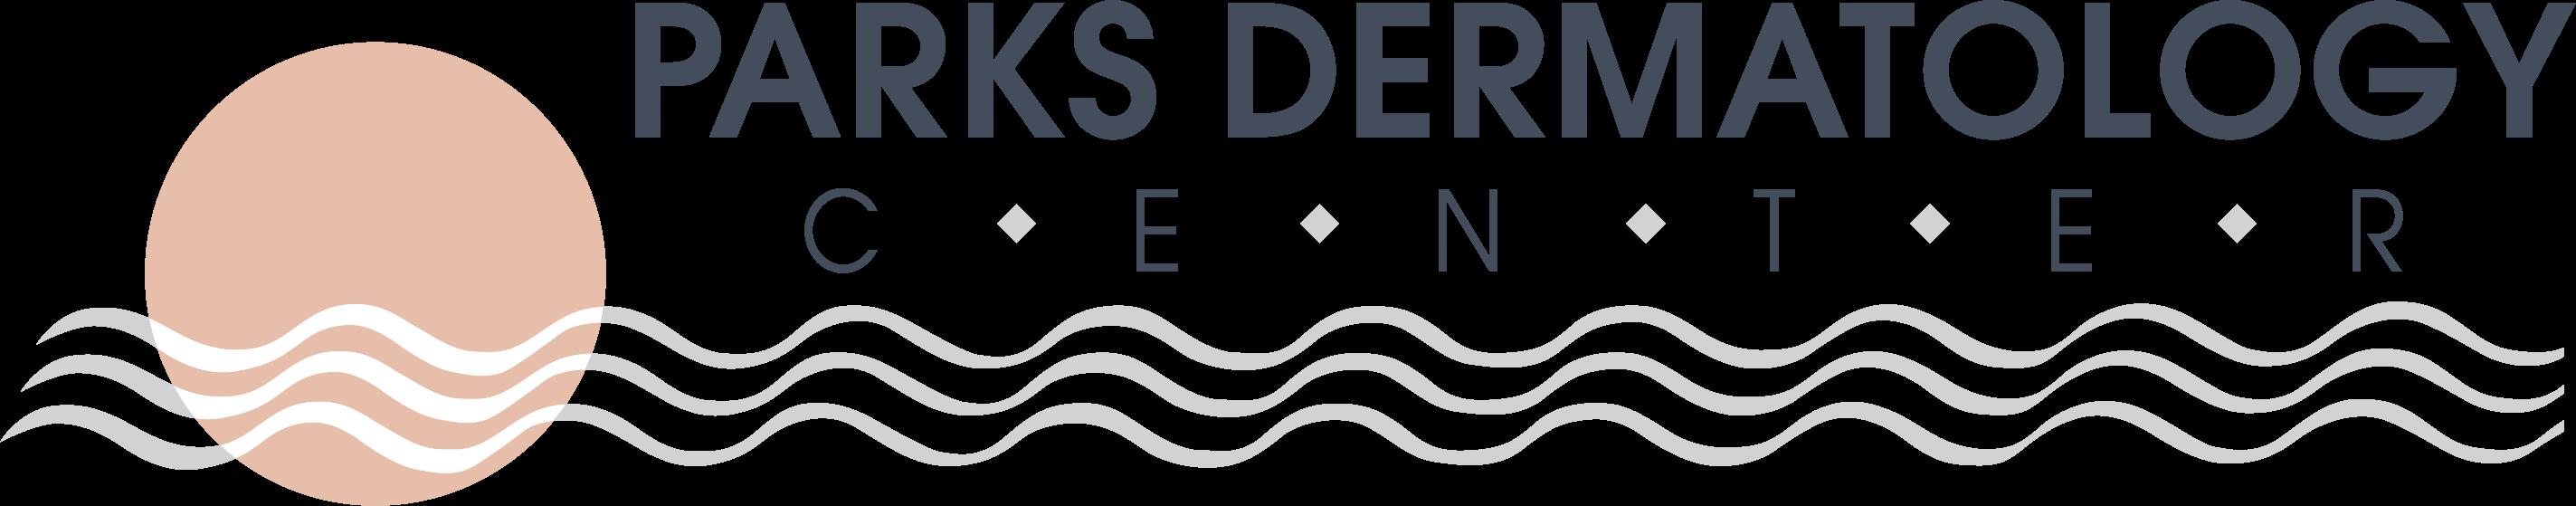 Parks Dermatology Center